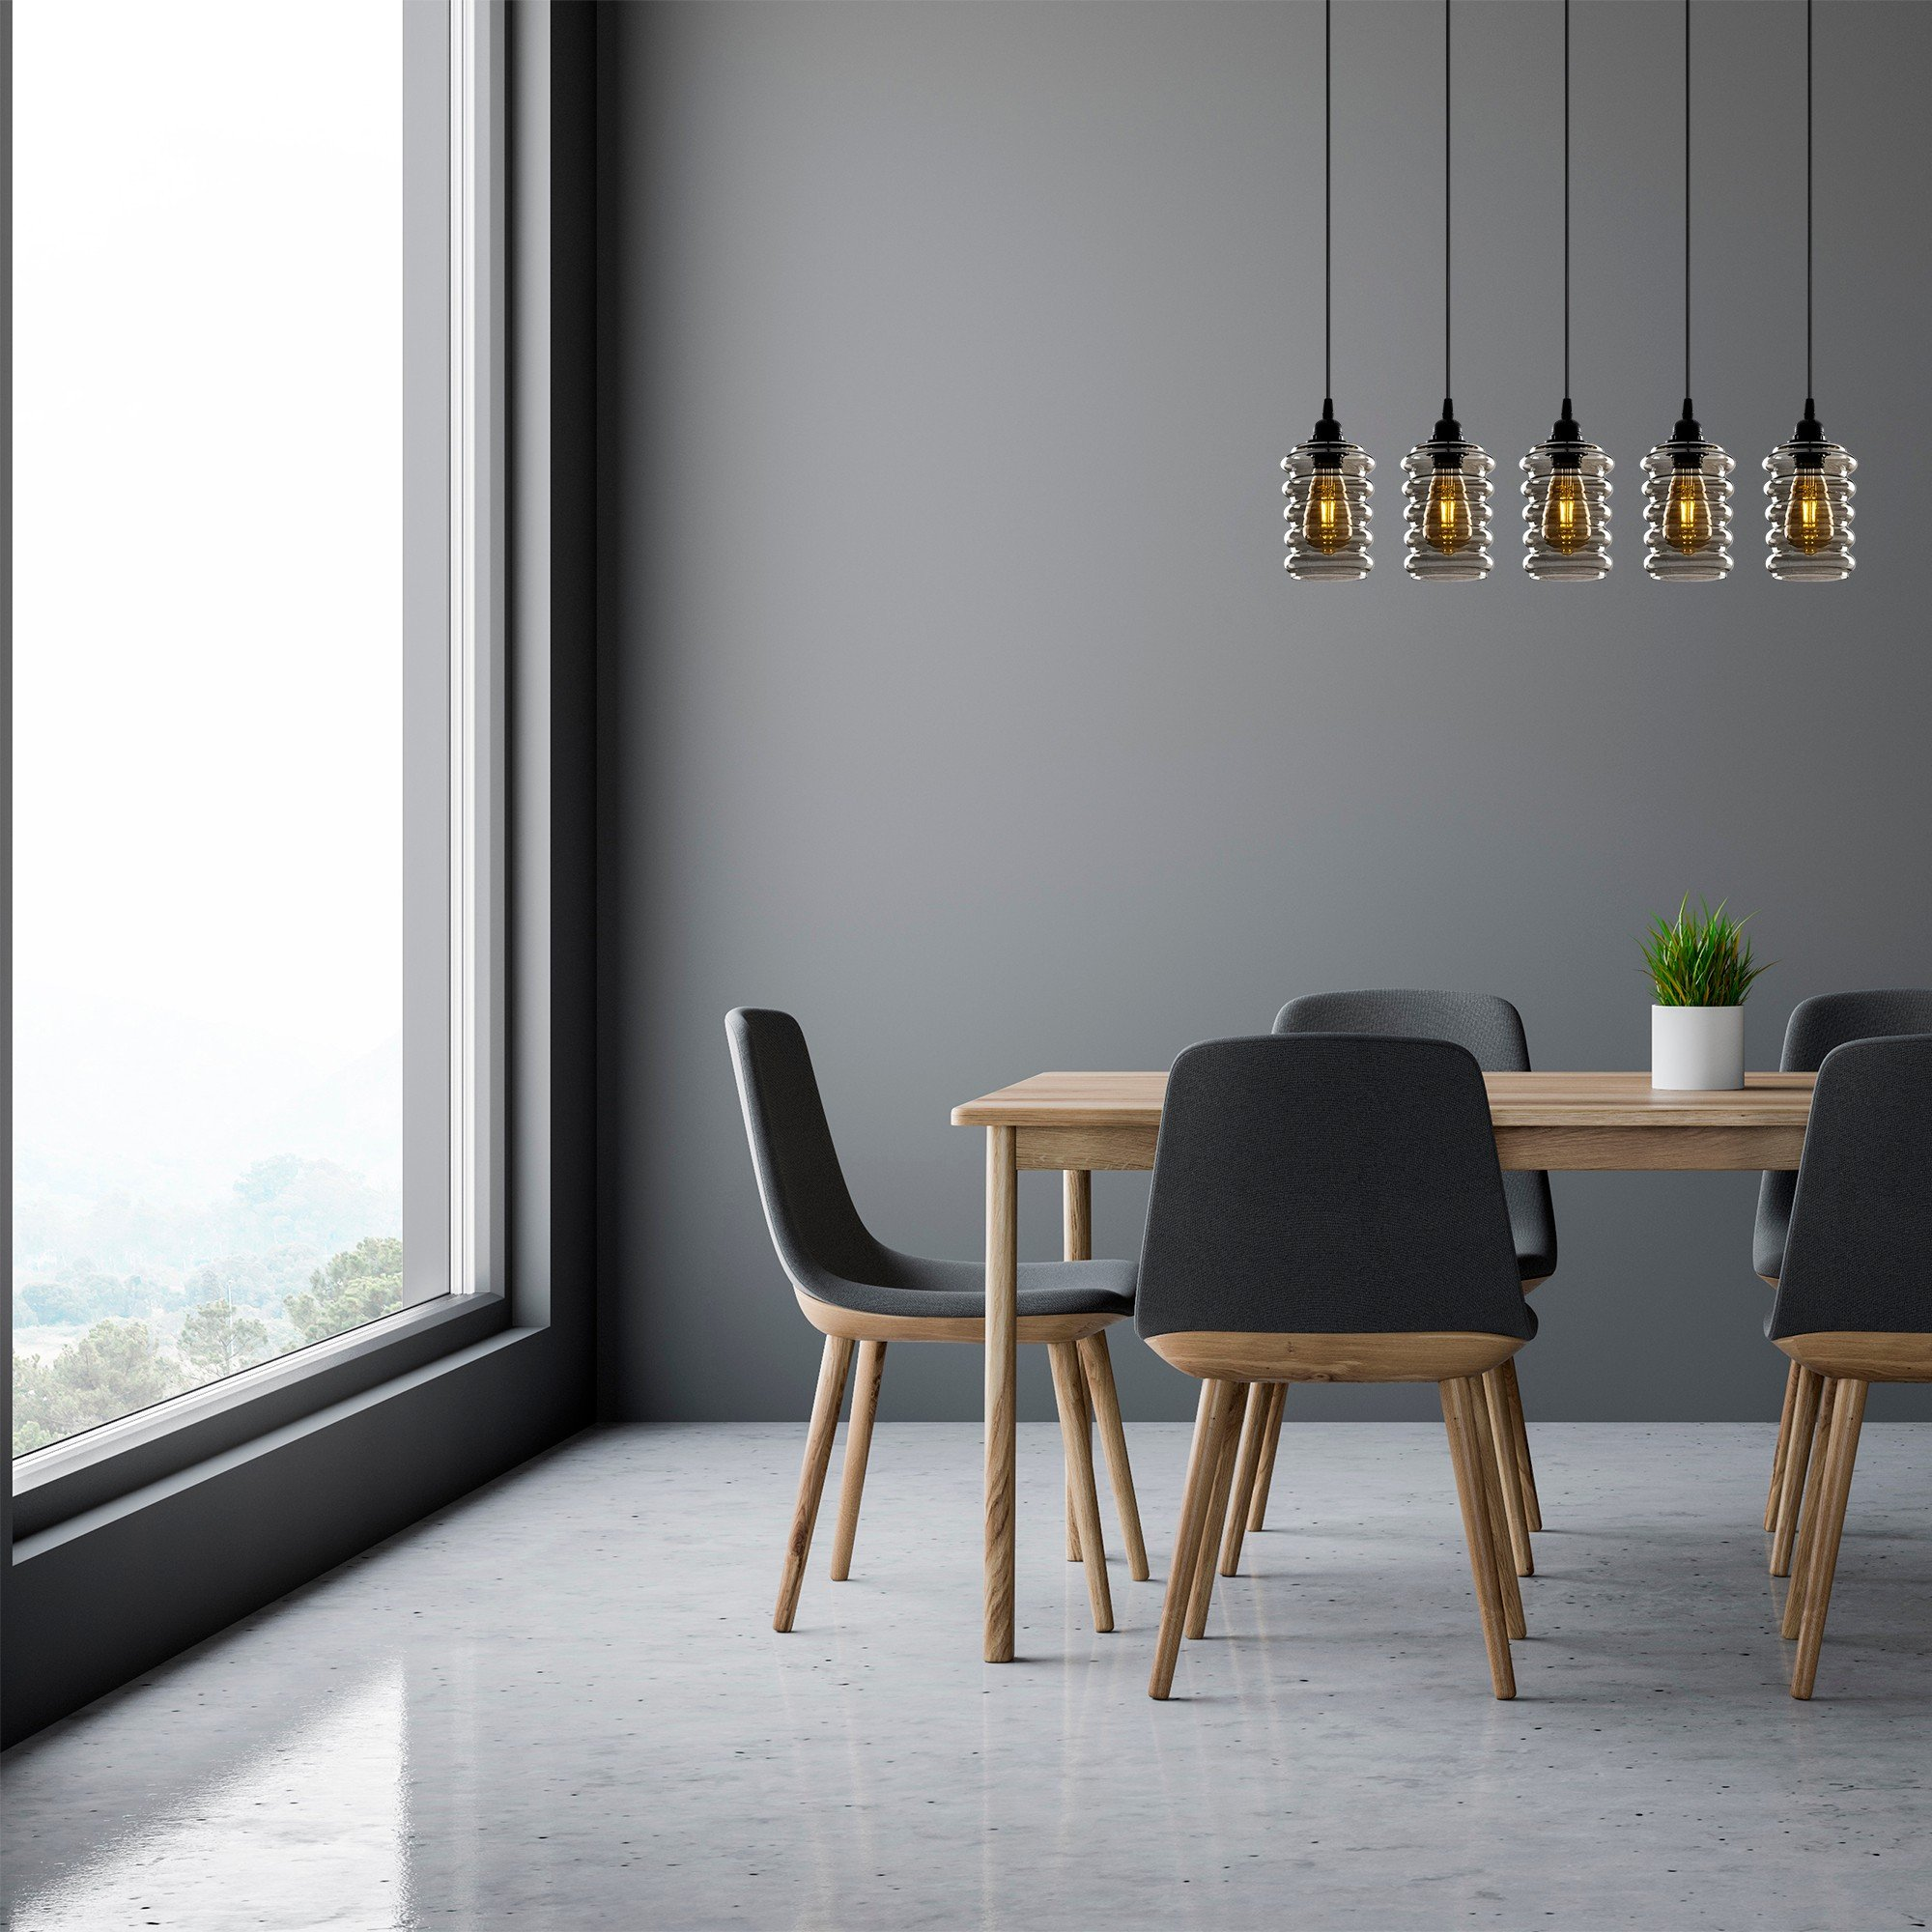 Hanglamp smoked glass 5 x E27 fitting - inrichting